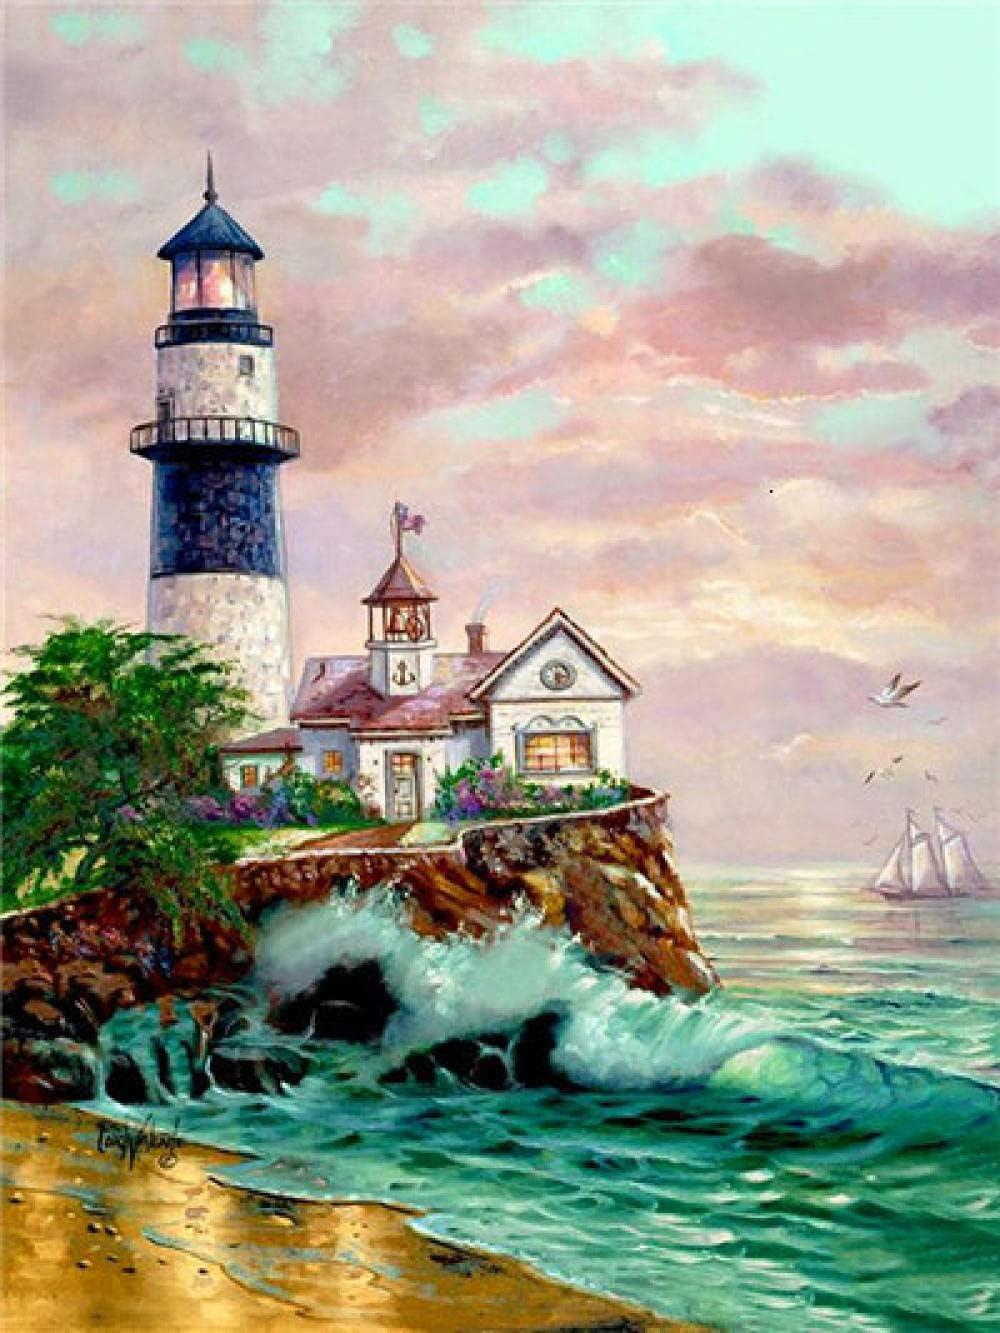 Awttmua 5D DIY Diamond Stitch Cross Lighthouse Some reservation High material Painting